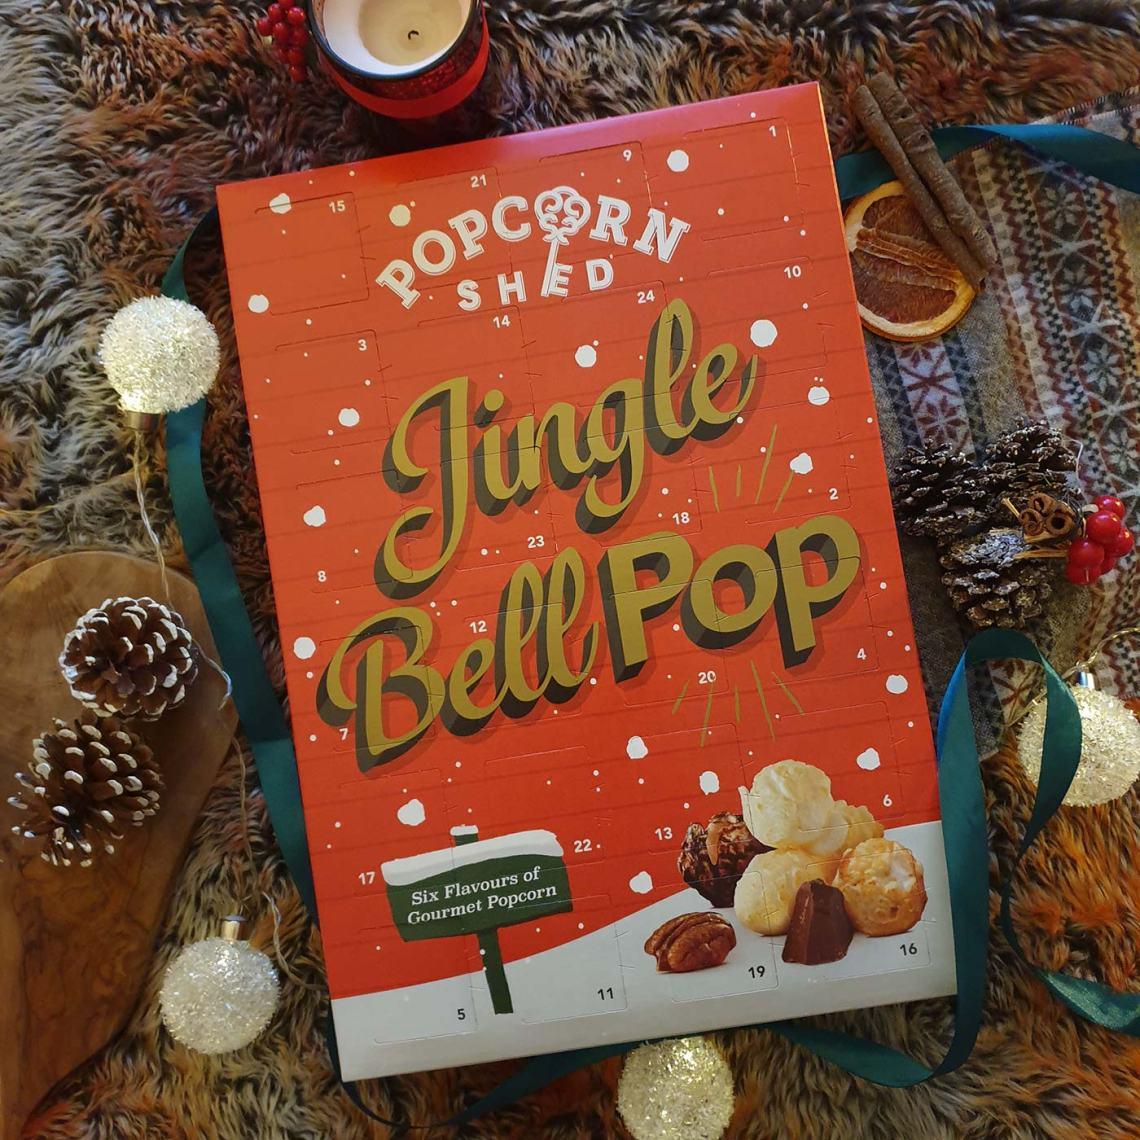 Best Foodie Advent Calendars - Popcorn Shed, Jingle Bell Pop - Female Original